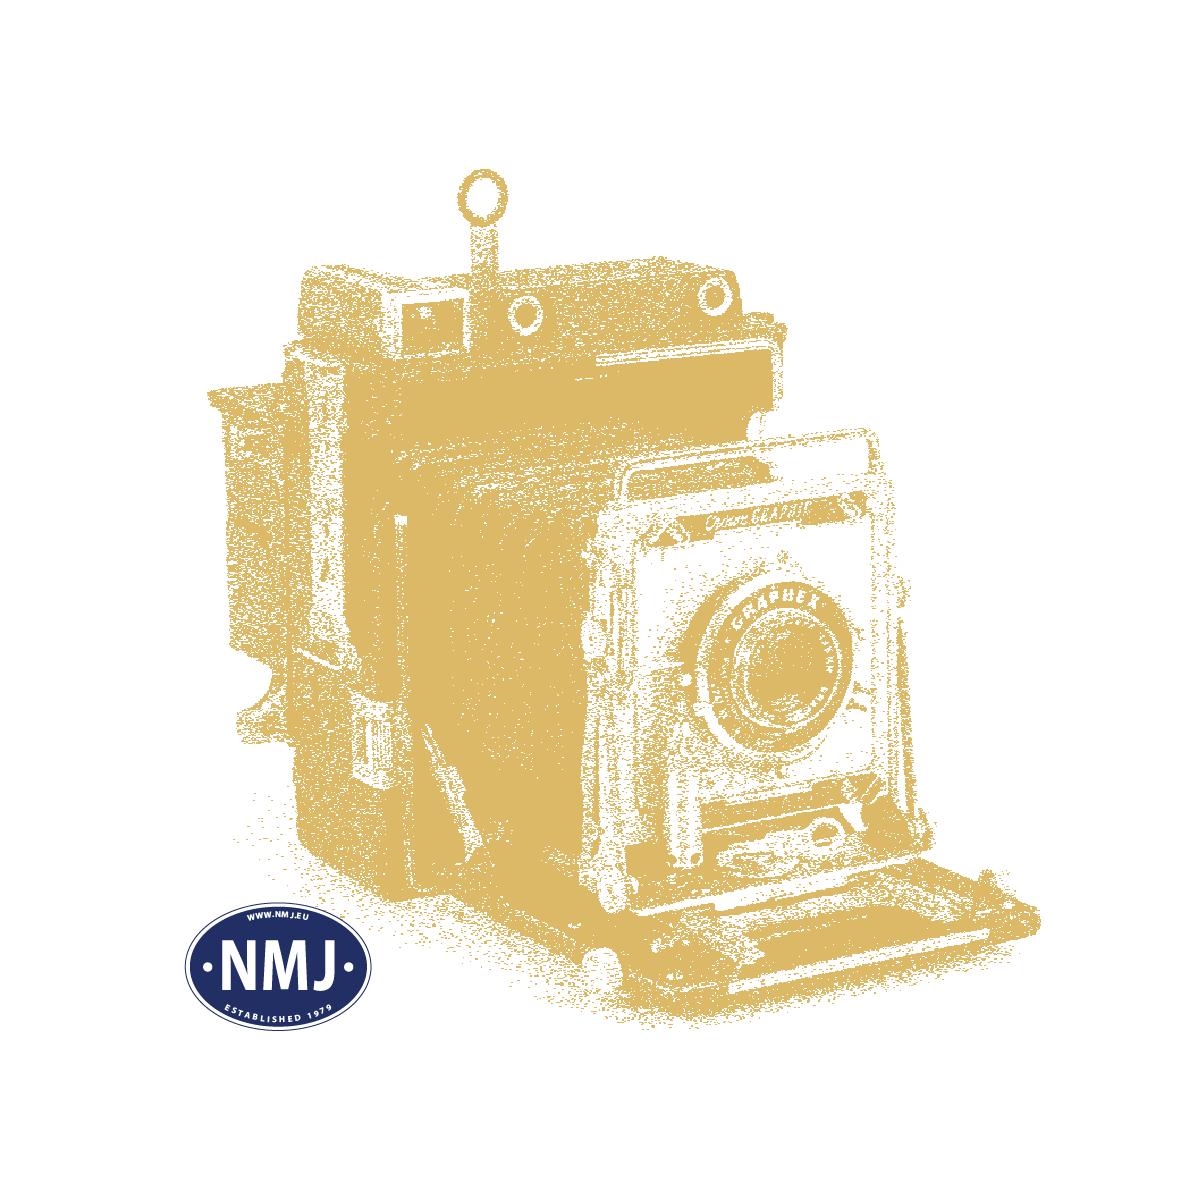 NMJT90017 - NMJ Topline NSB Di3a.605 Neues Design OL-Logo 1994, DC